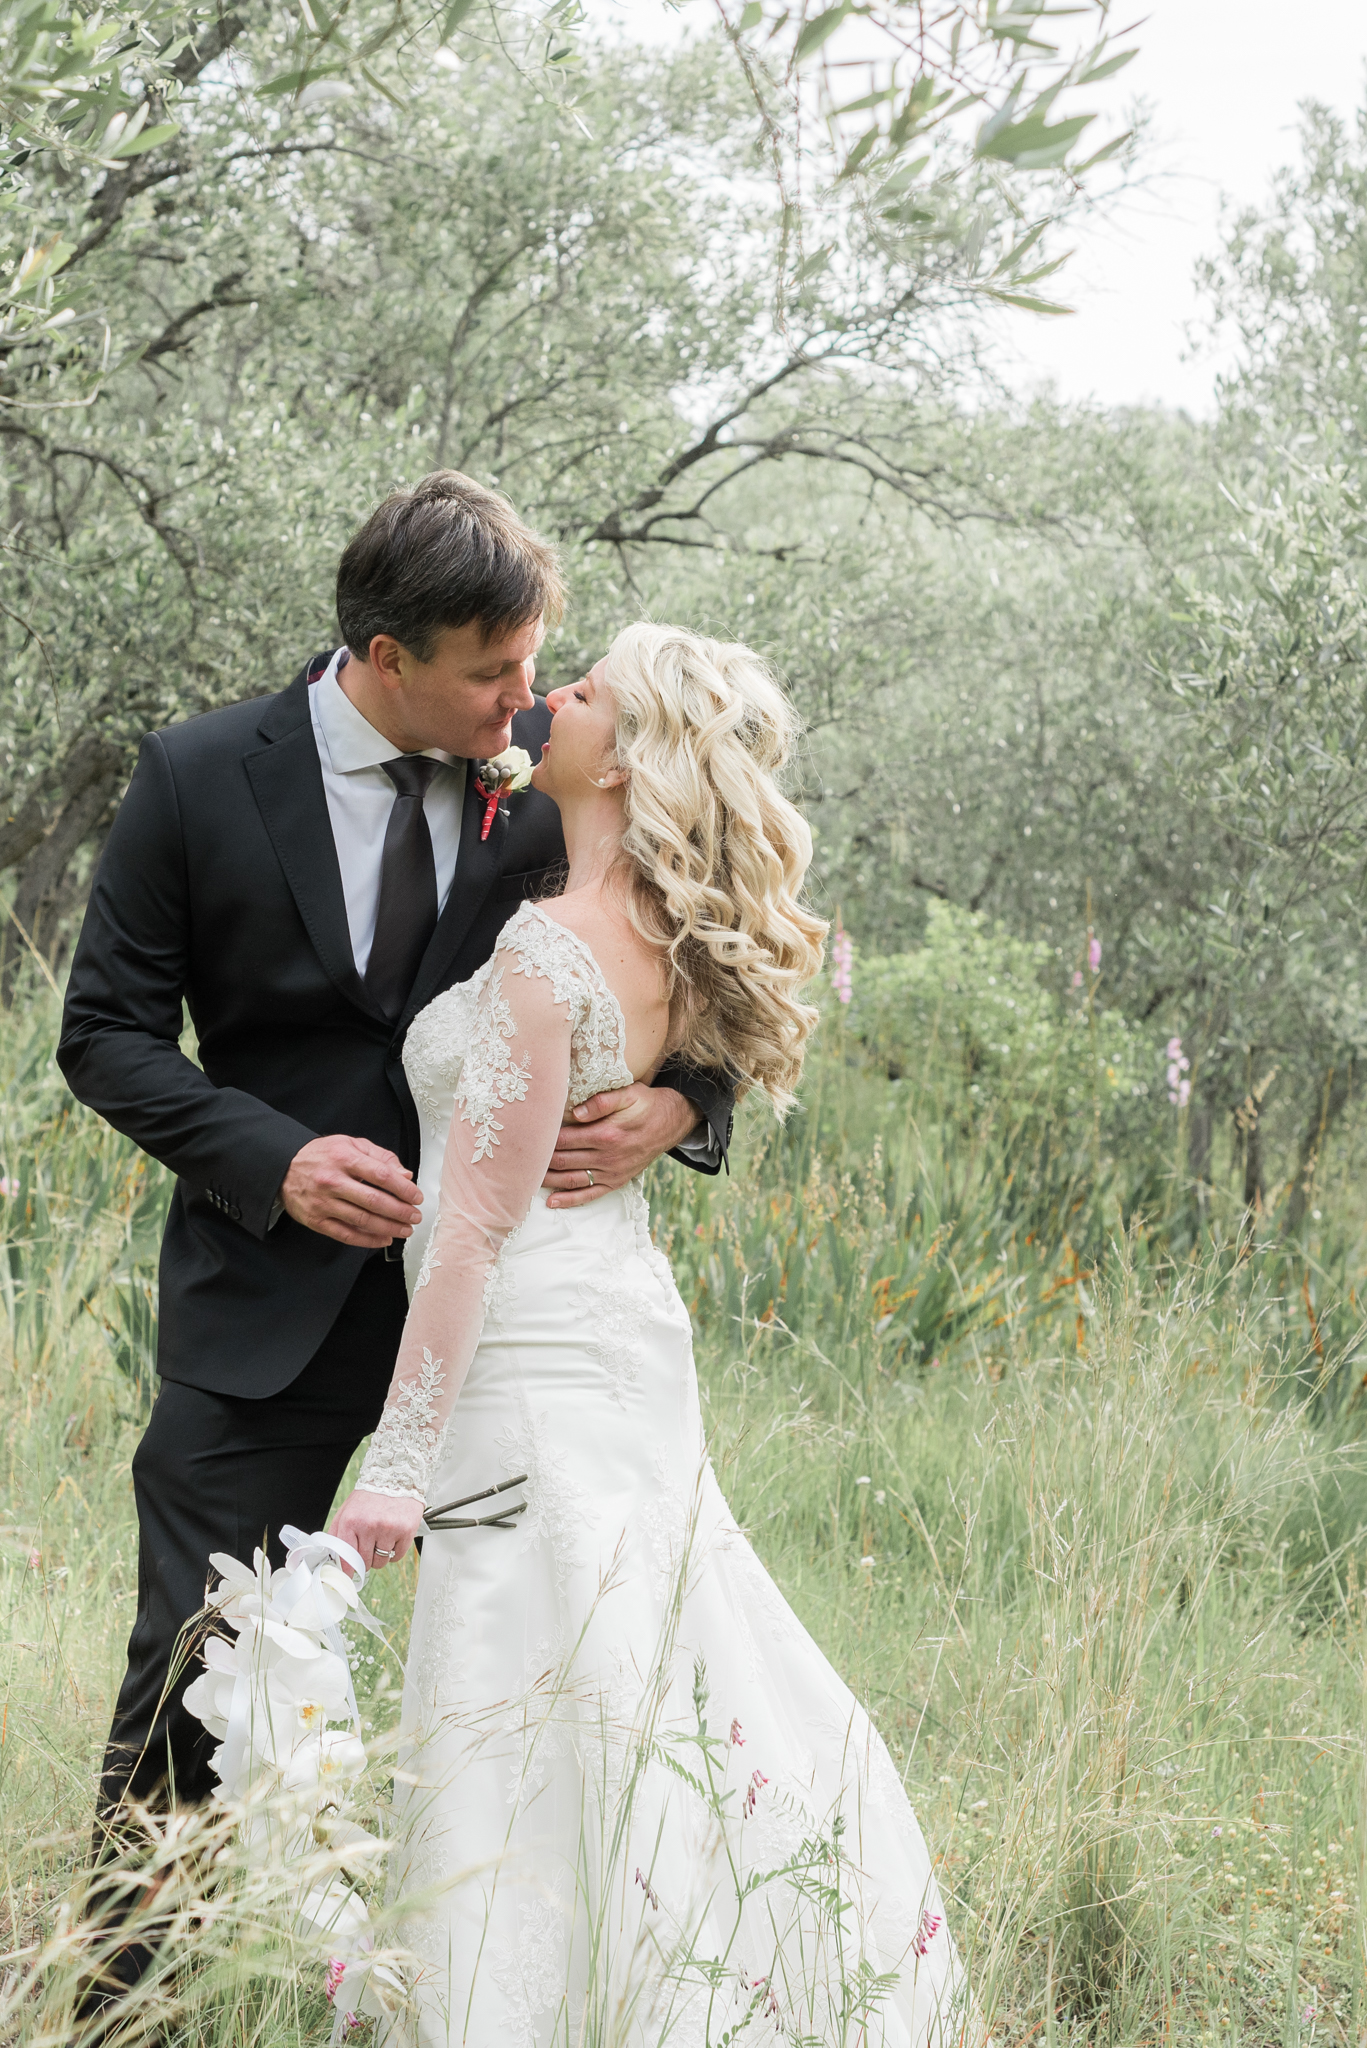 Angelique_Smith_Photography_Pieter&Yvonne_Wedding-369.jpg